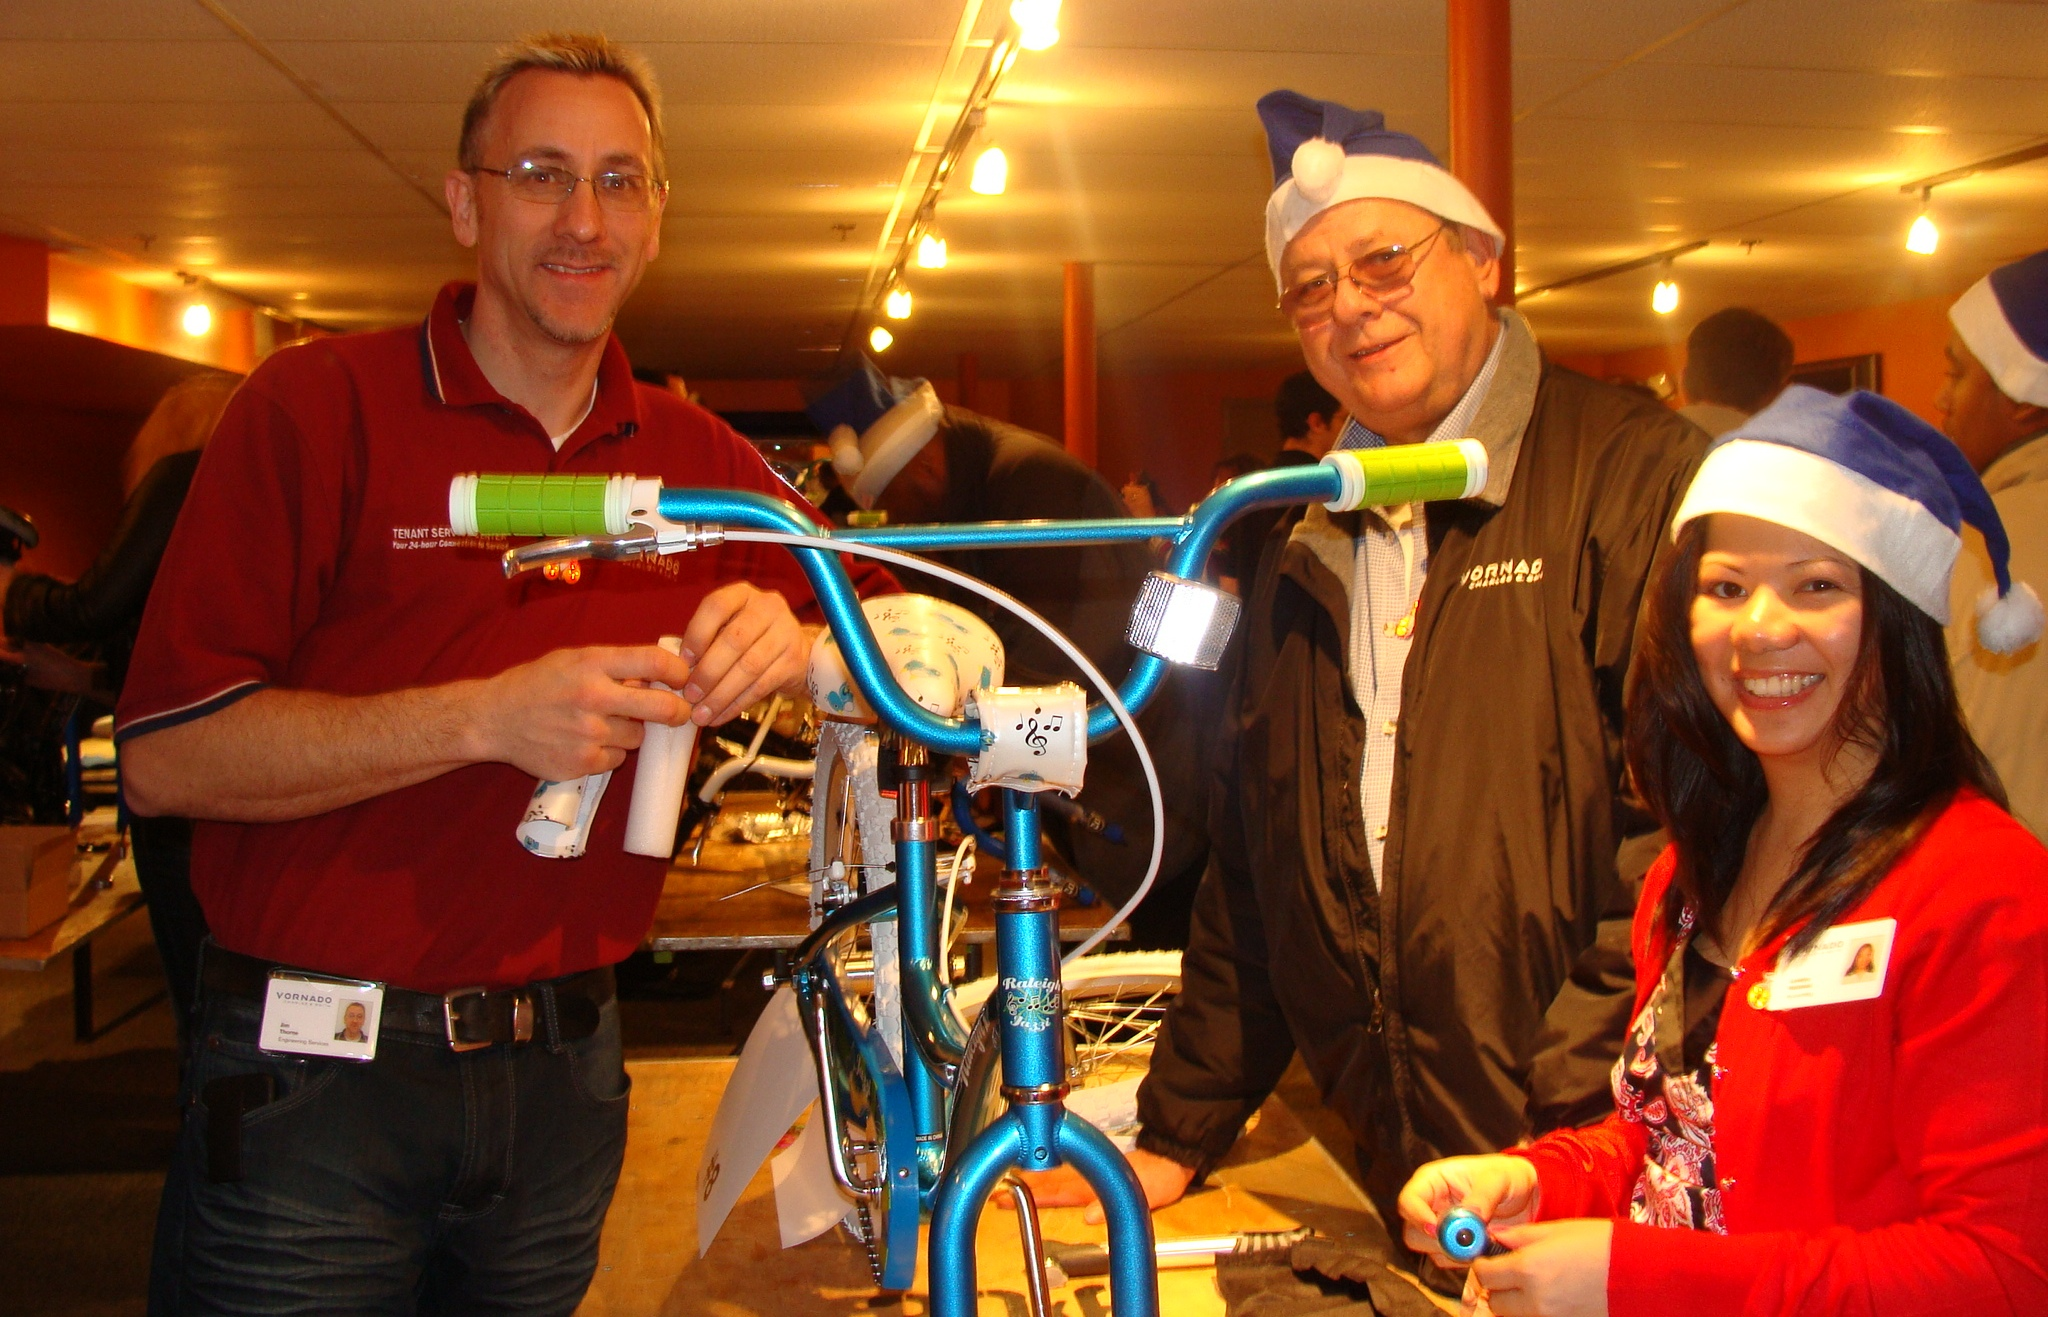 vornado corporate charity bike build team building